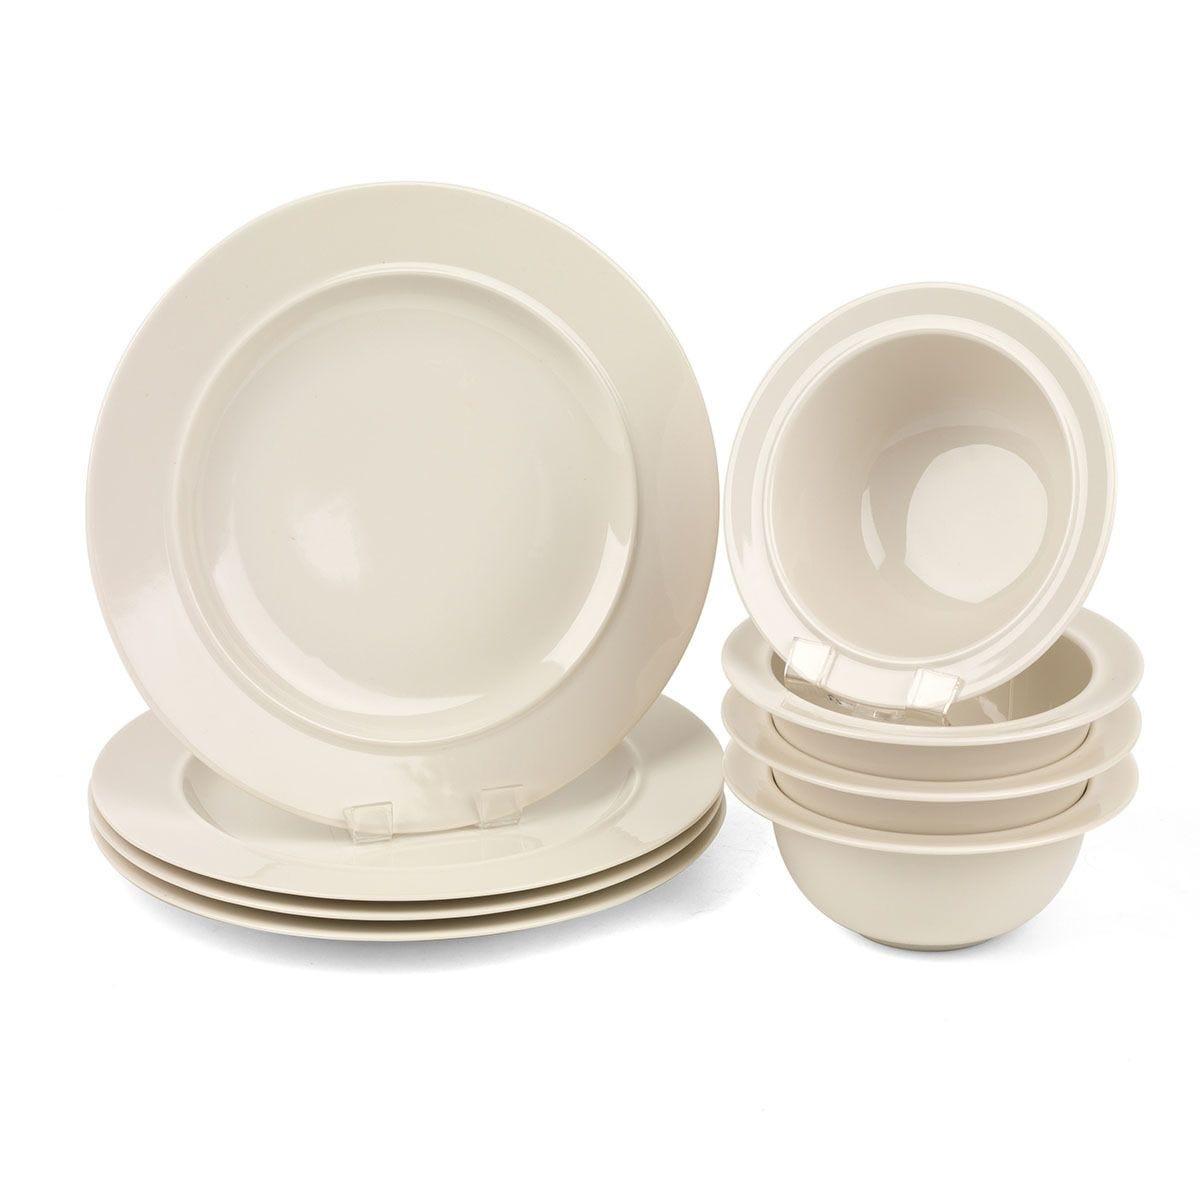 Alessi La Bella Travola Porcelain Dinner Plate And Bowl Set 8 Piece Robert Dyas